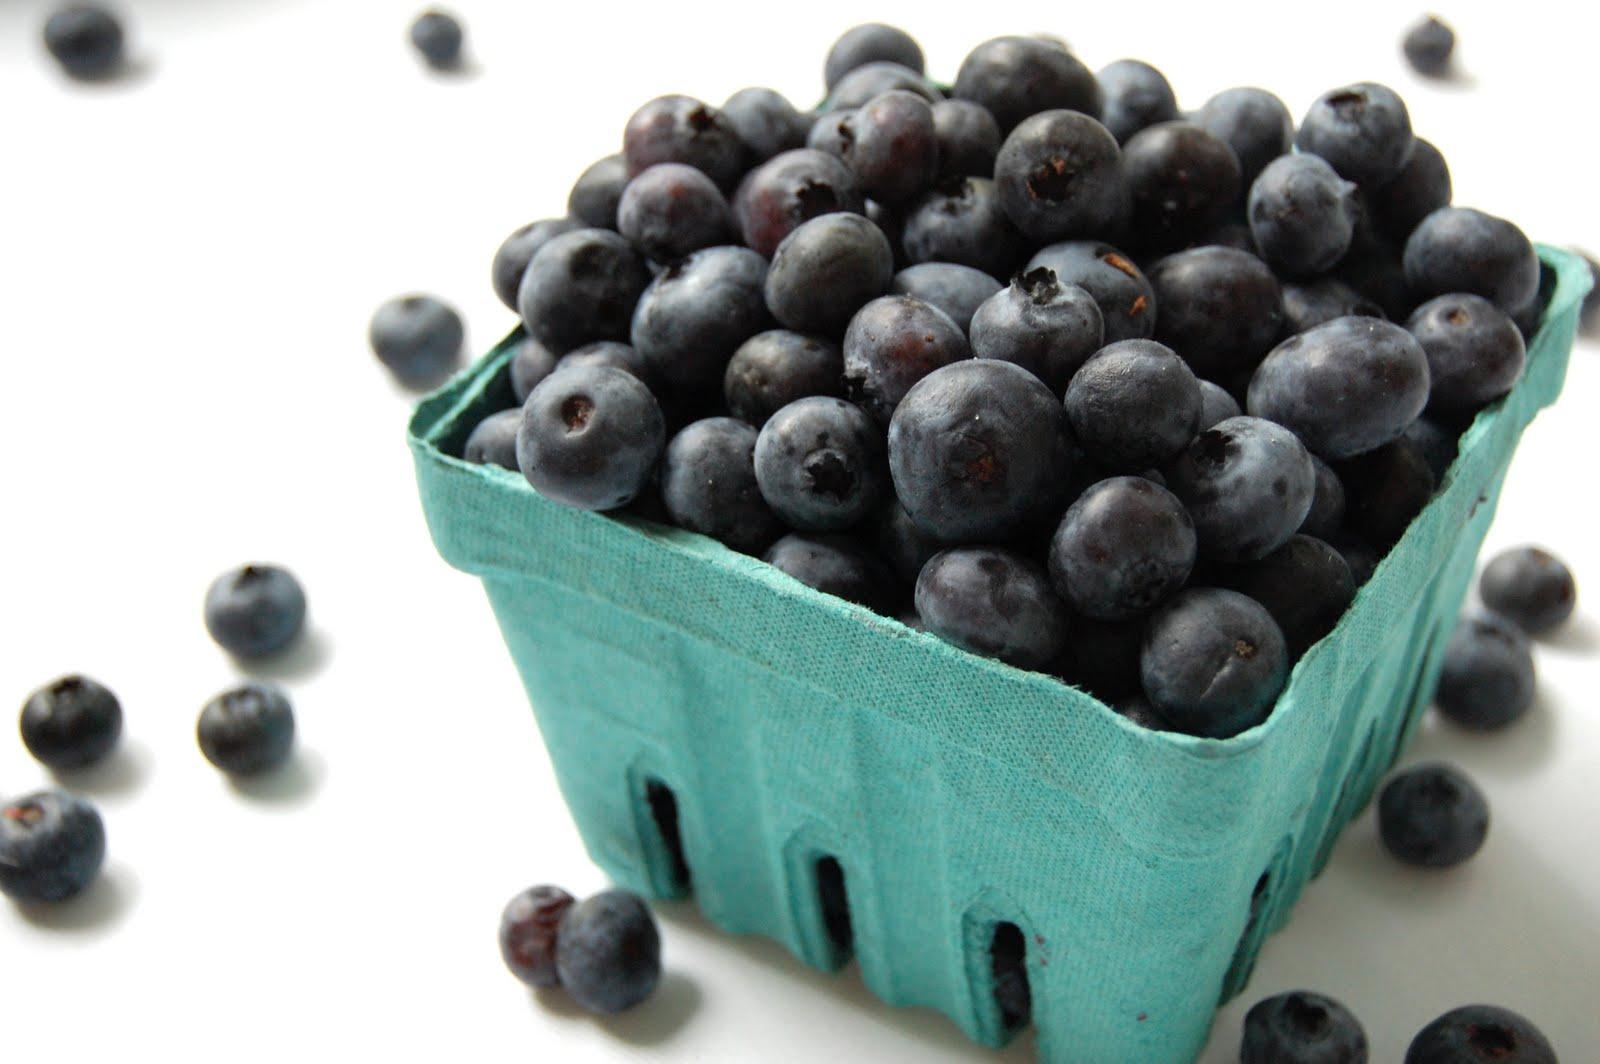 blueberry_basket